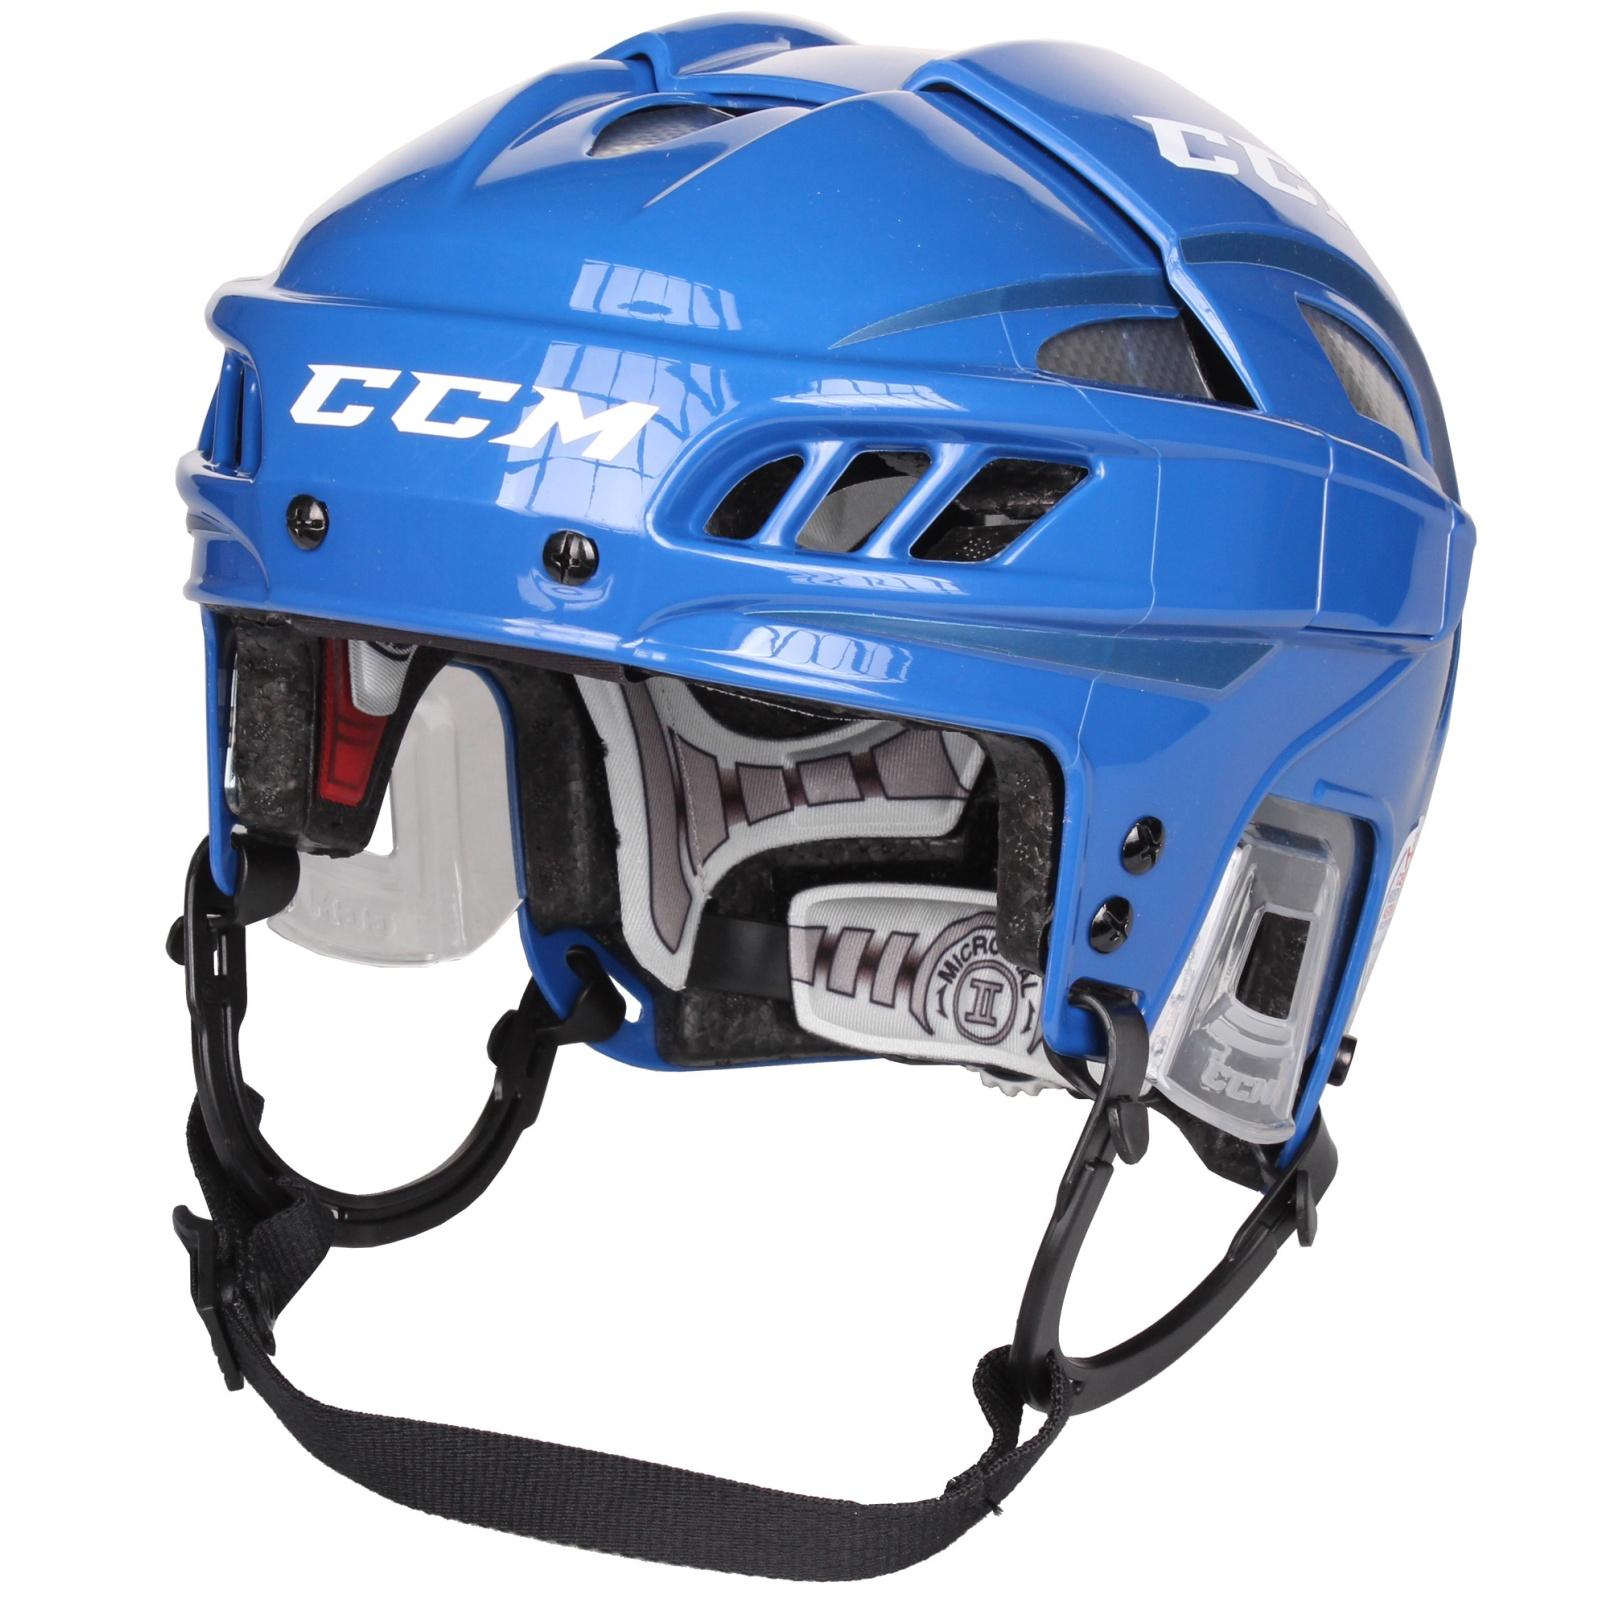 Hokejová helma CCM FitLite modrá - veľ. L